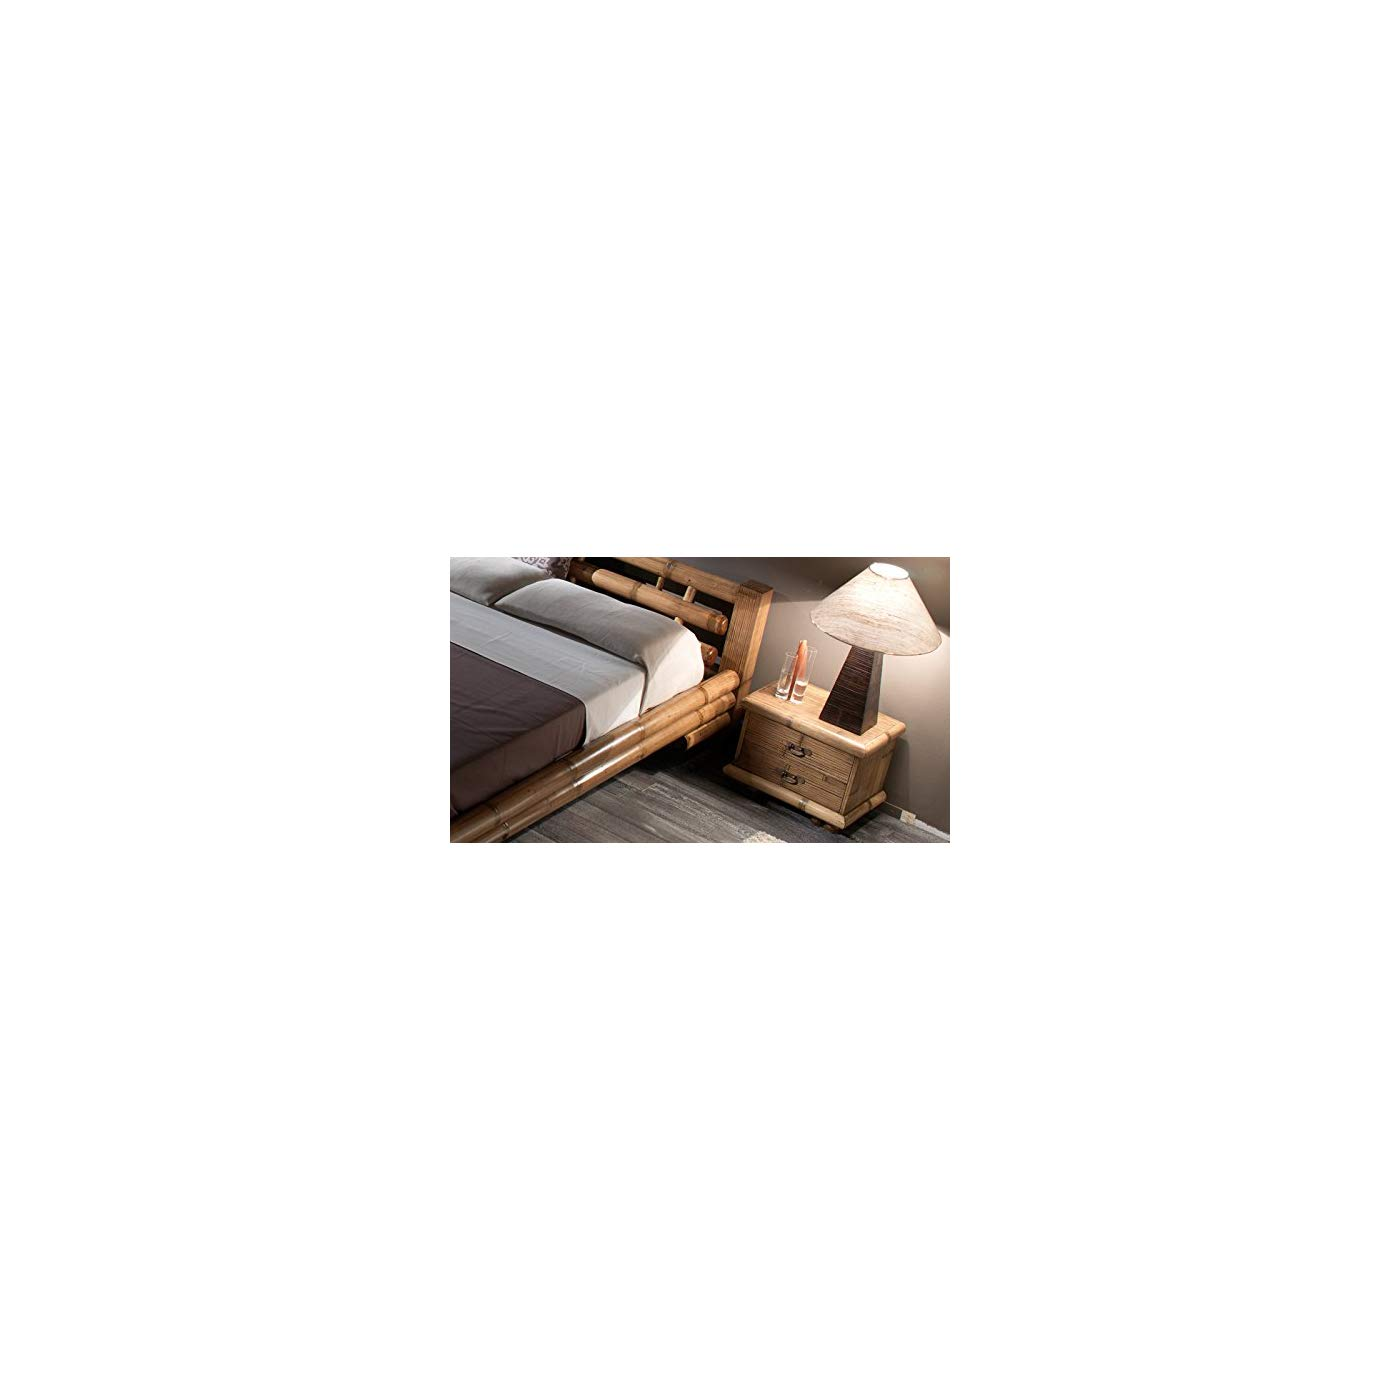 Full Size of Bambus Bett Hochwertiges 140200 Tabanan Bambusbett 140 200 Ausziehbar Tagesdecke Lifetime Mit Gästebett Günstig Kaufen Musterring Betten 180x200 Bettkasten Bett Bambus Bett